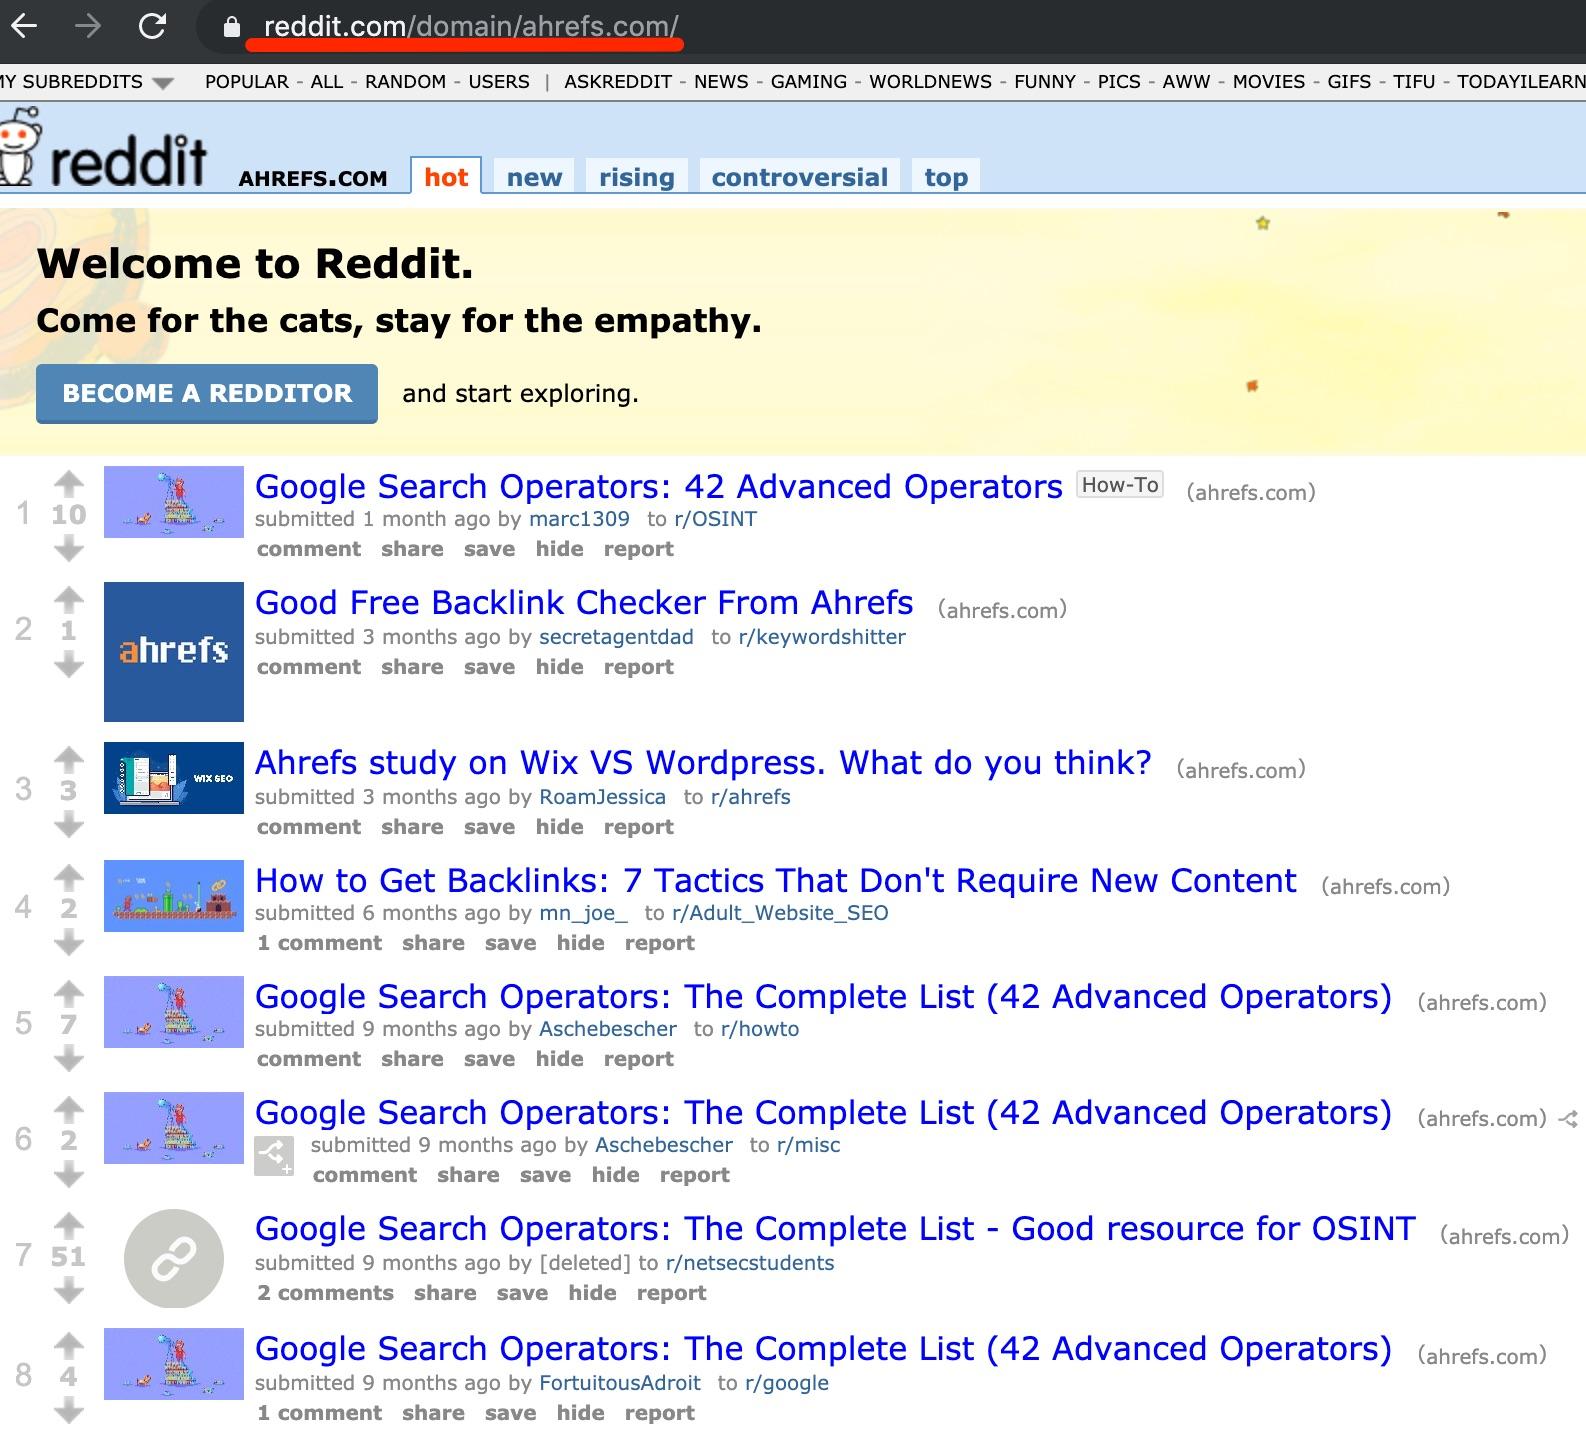 ahrefs com on reddit com